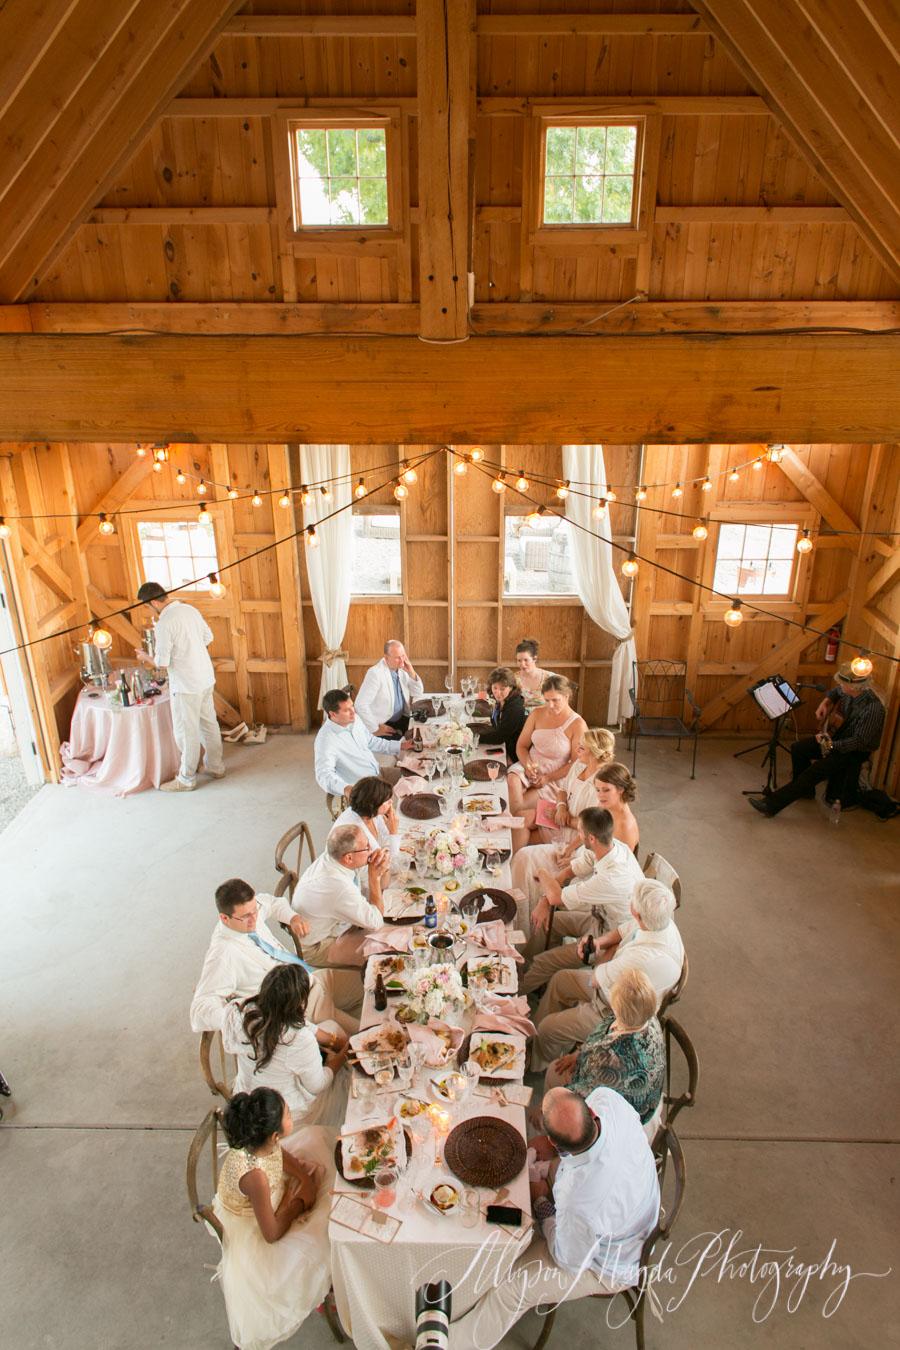 hammersky vineyards wedding reception